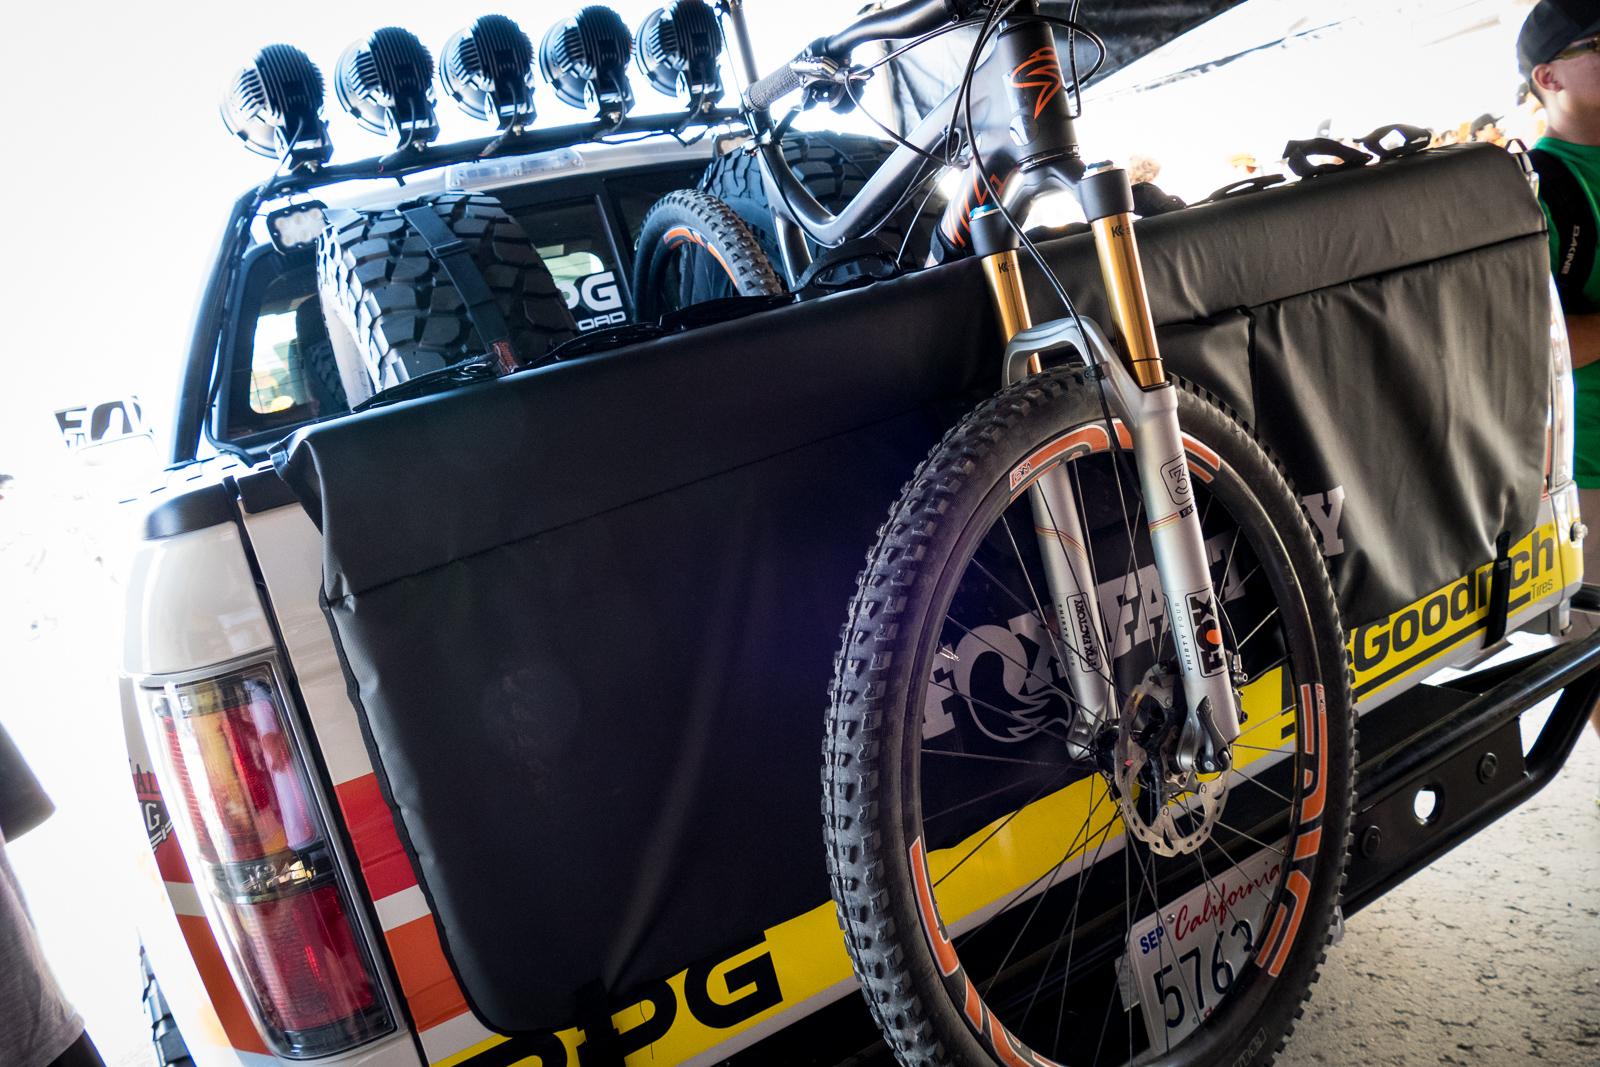 Drag Racing Helmets >> FOX Tailgate Pad - 2015 Sea Otter Classic Pit Bits - Mountain Biking Pictures - Vital MTB